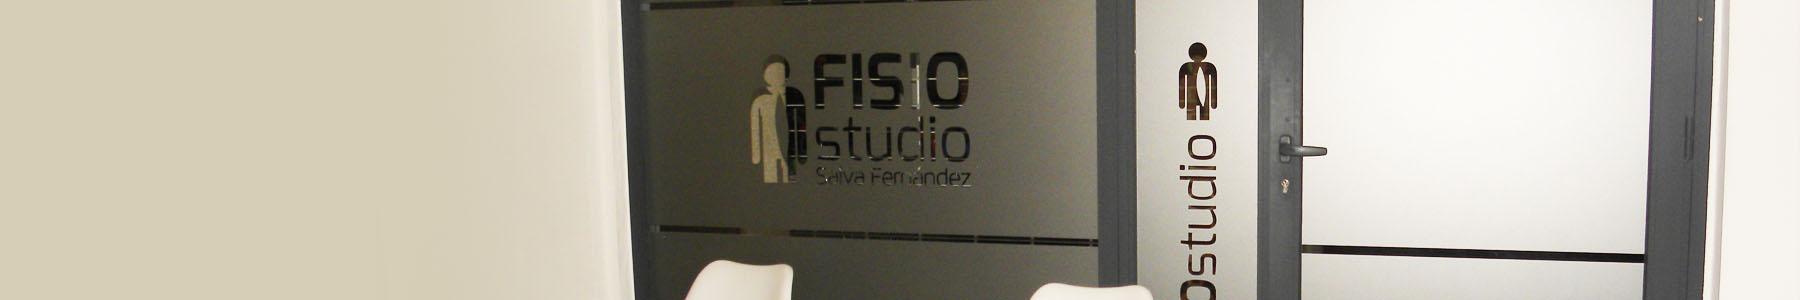 http://www.fisiostudio.net/wp-content/uploads/2016/01/slider-clinica.jpg